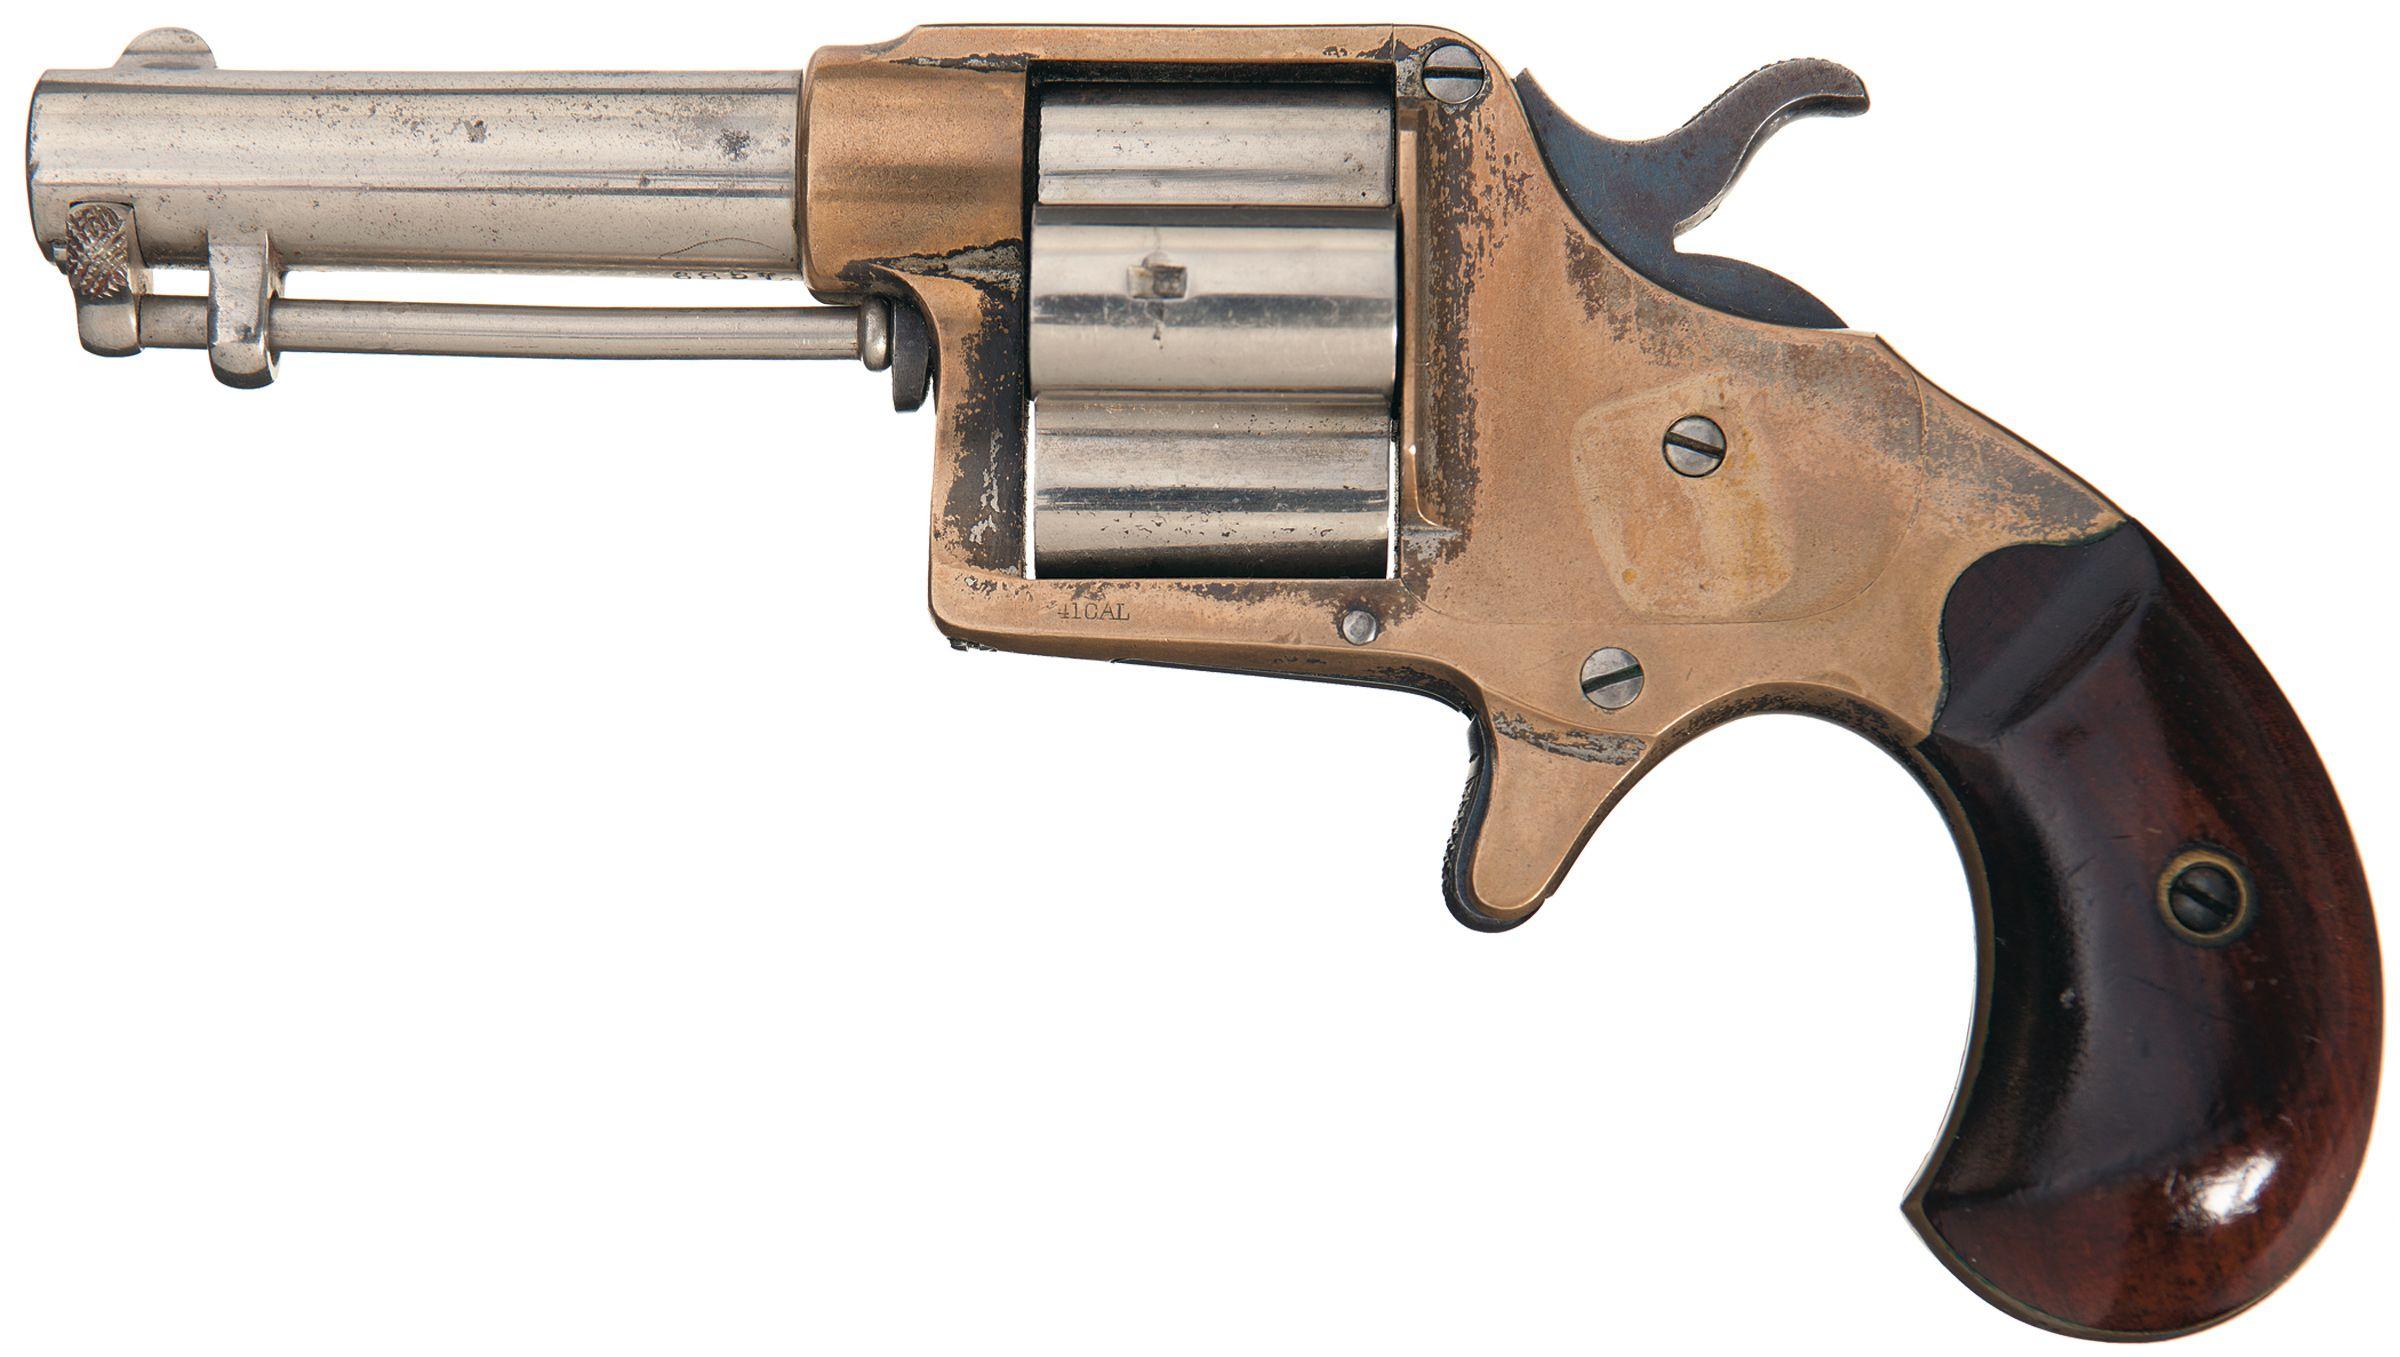 Fine Colt House Model Cloverleaf Revolver cal 41 RF | Revolvers